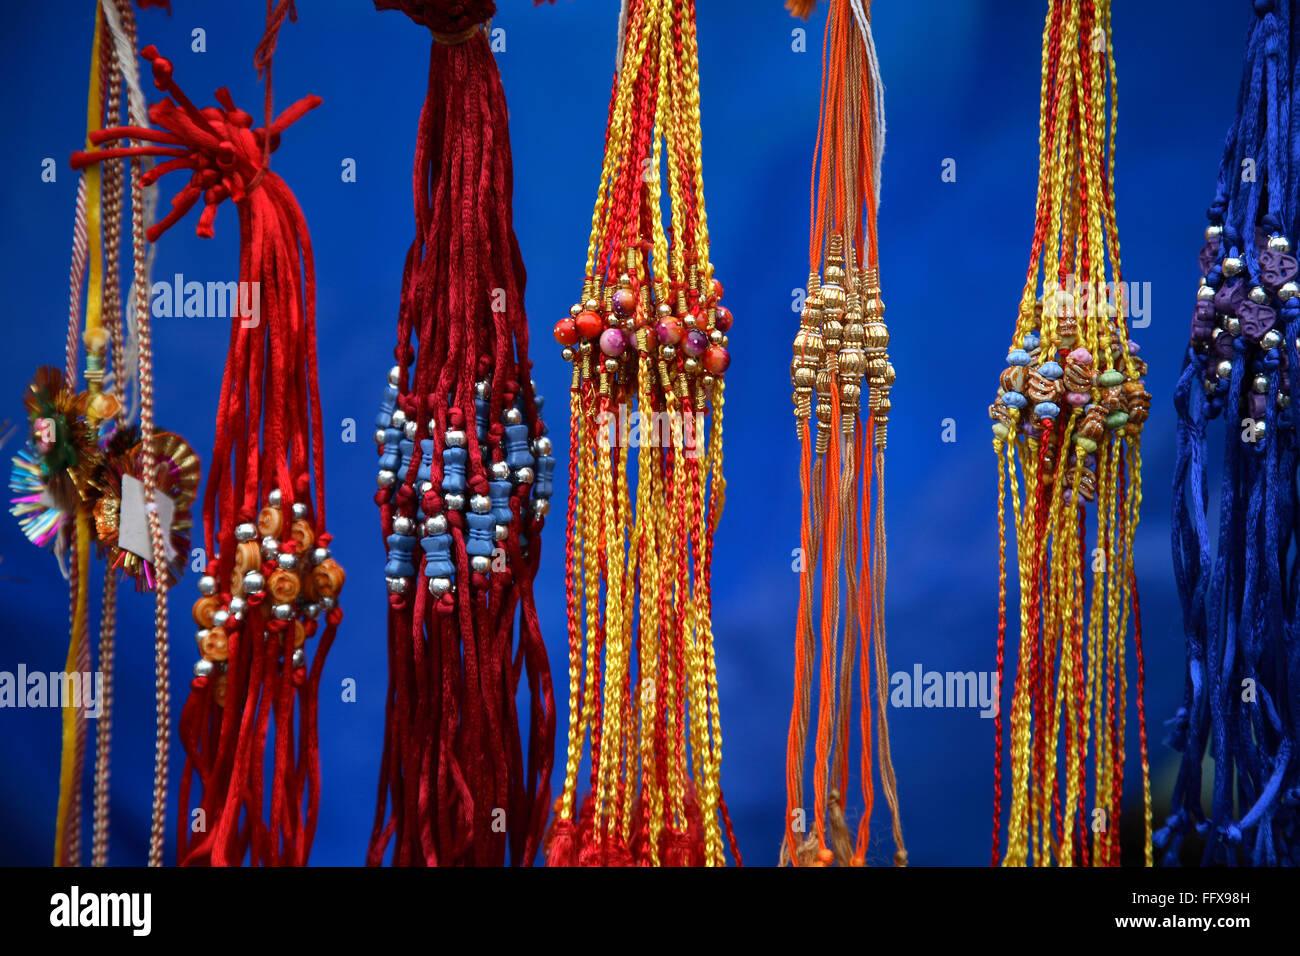 Rakhis , silk thread tied by sister to brother on Raksha Bandhan day , Colorful Rakhis for sale , India - Stock Image